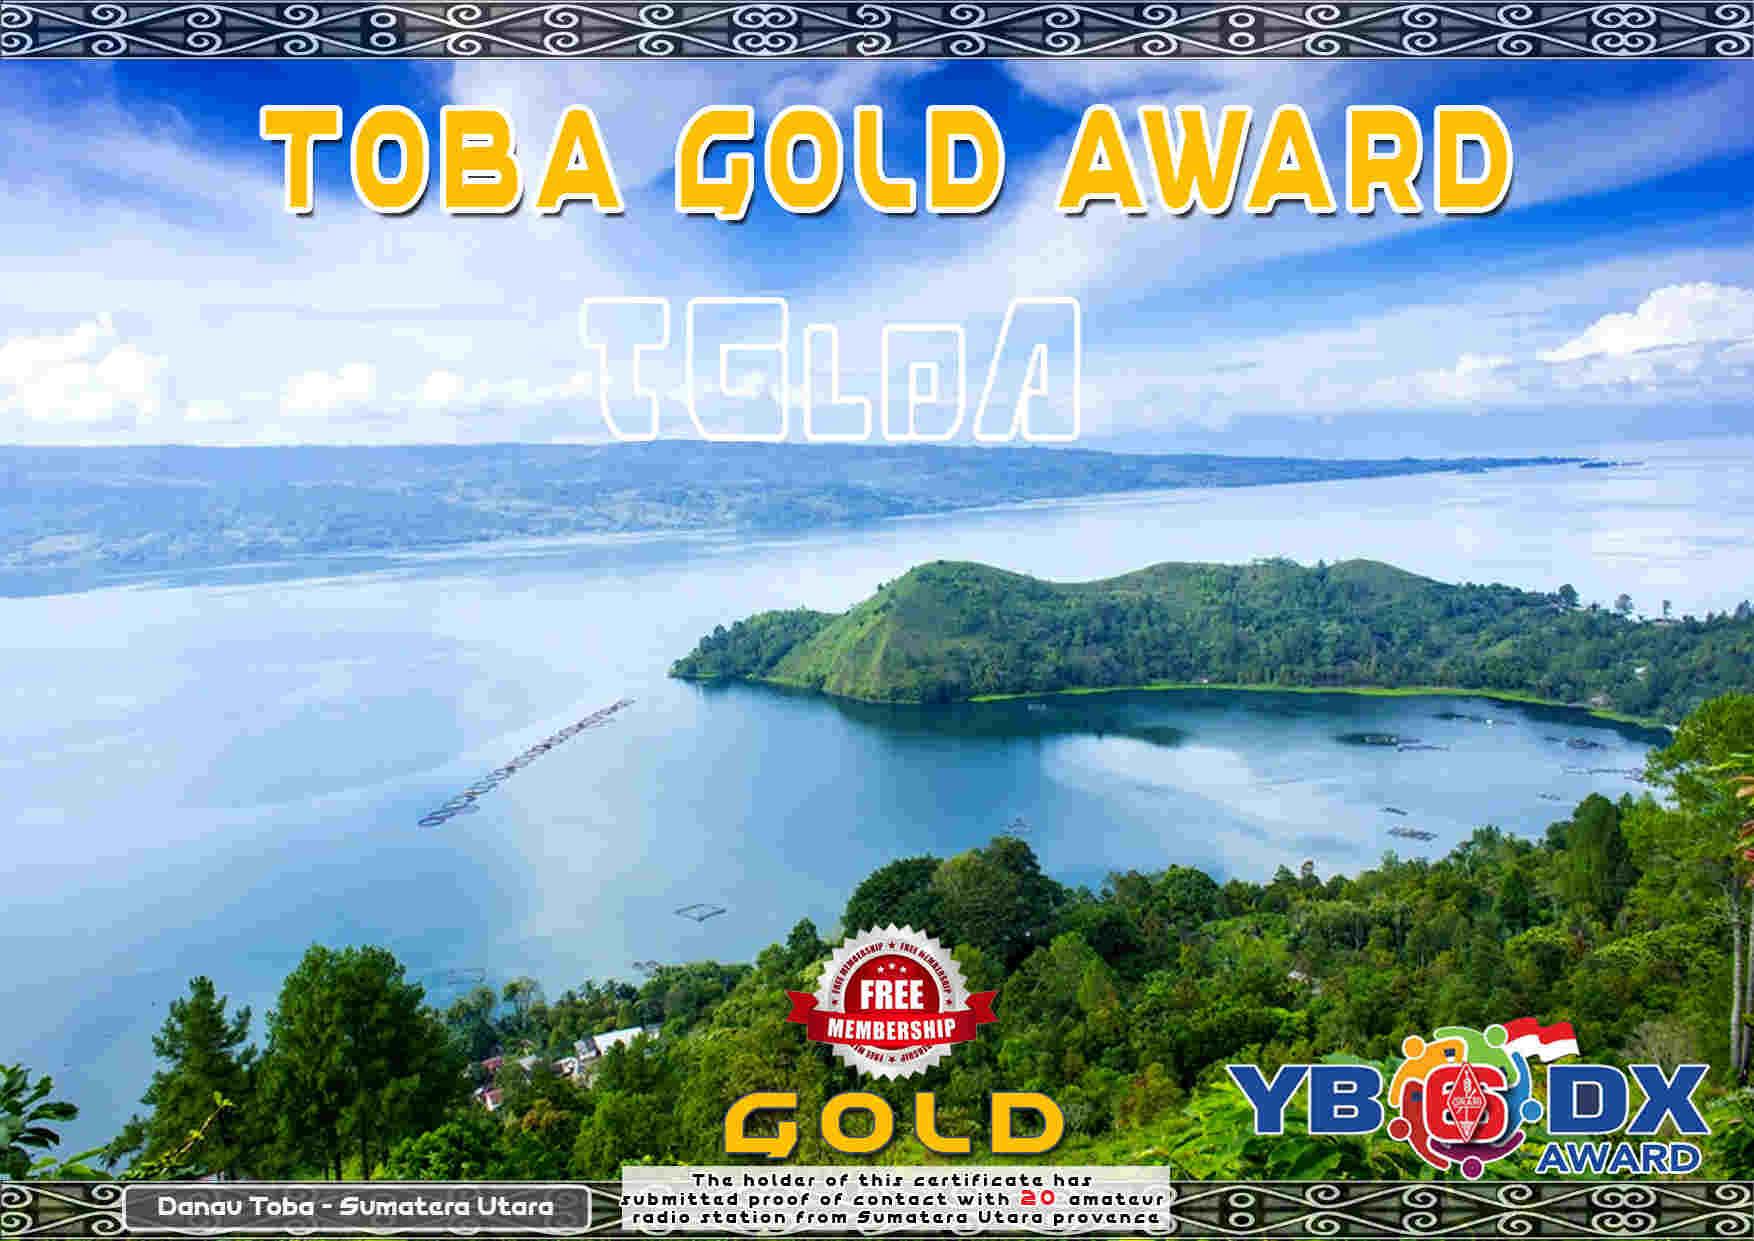 TOBA GOLD FREE AWARD